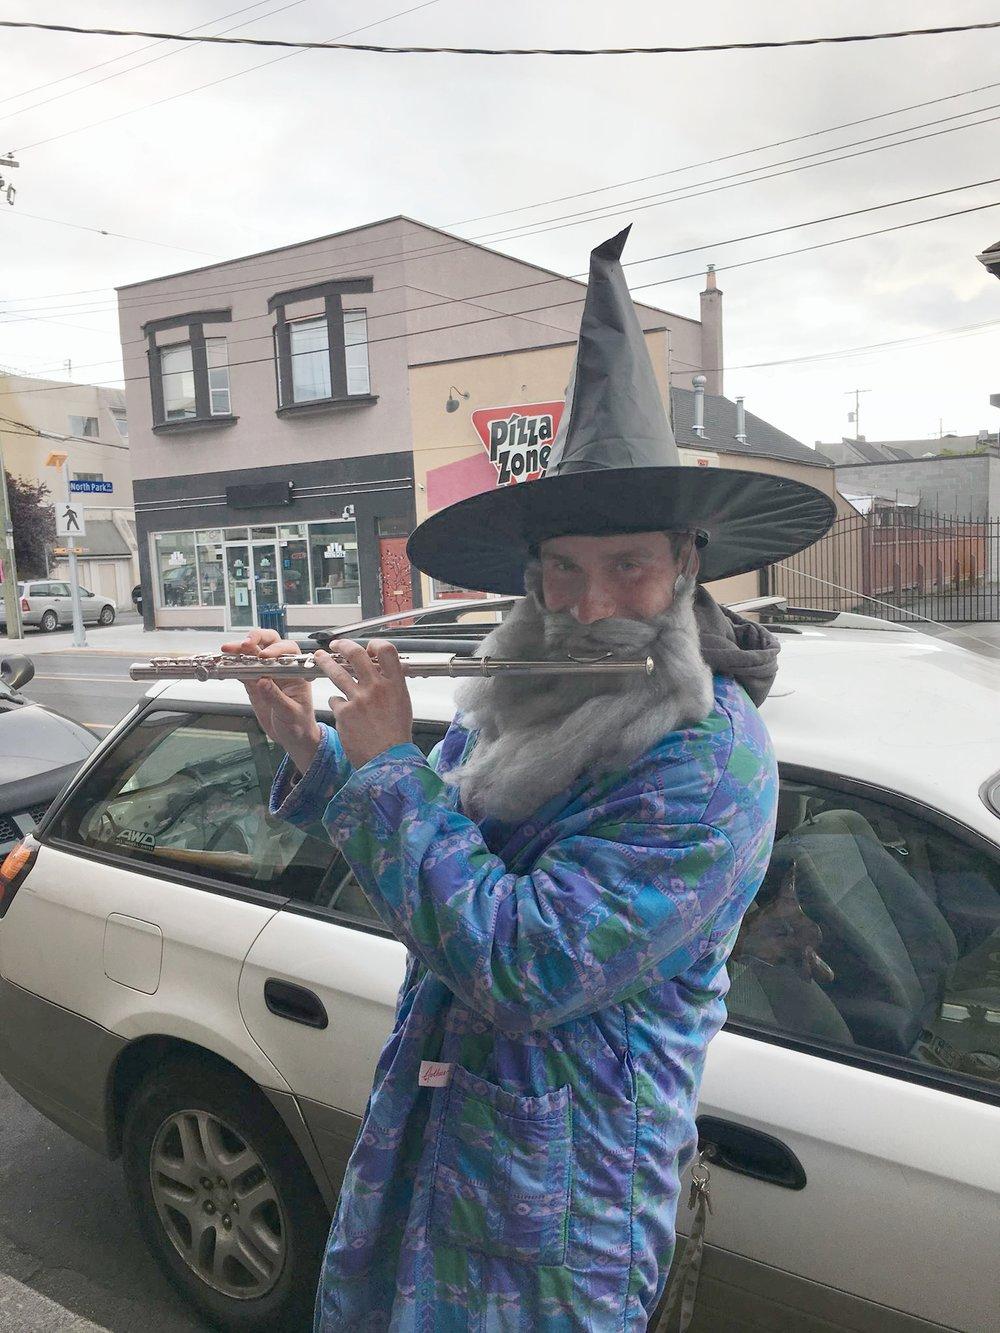 Boy Wizard - Main Instrument: KeysFace style: Beautiful and youngFavourite Spells: FireballUltra Stoked on Life: Yes